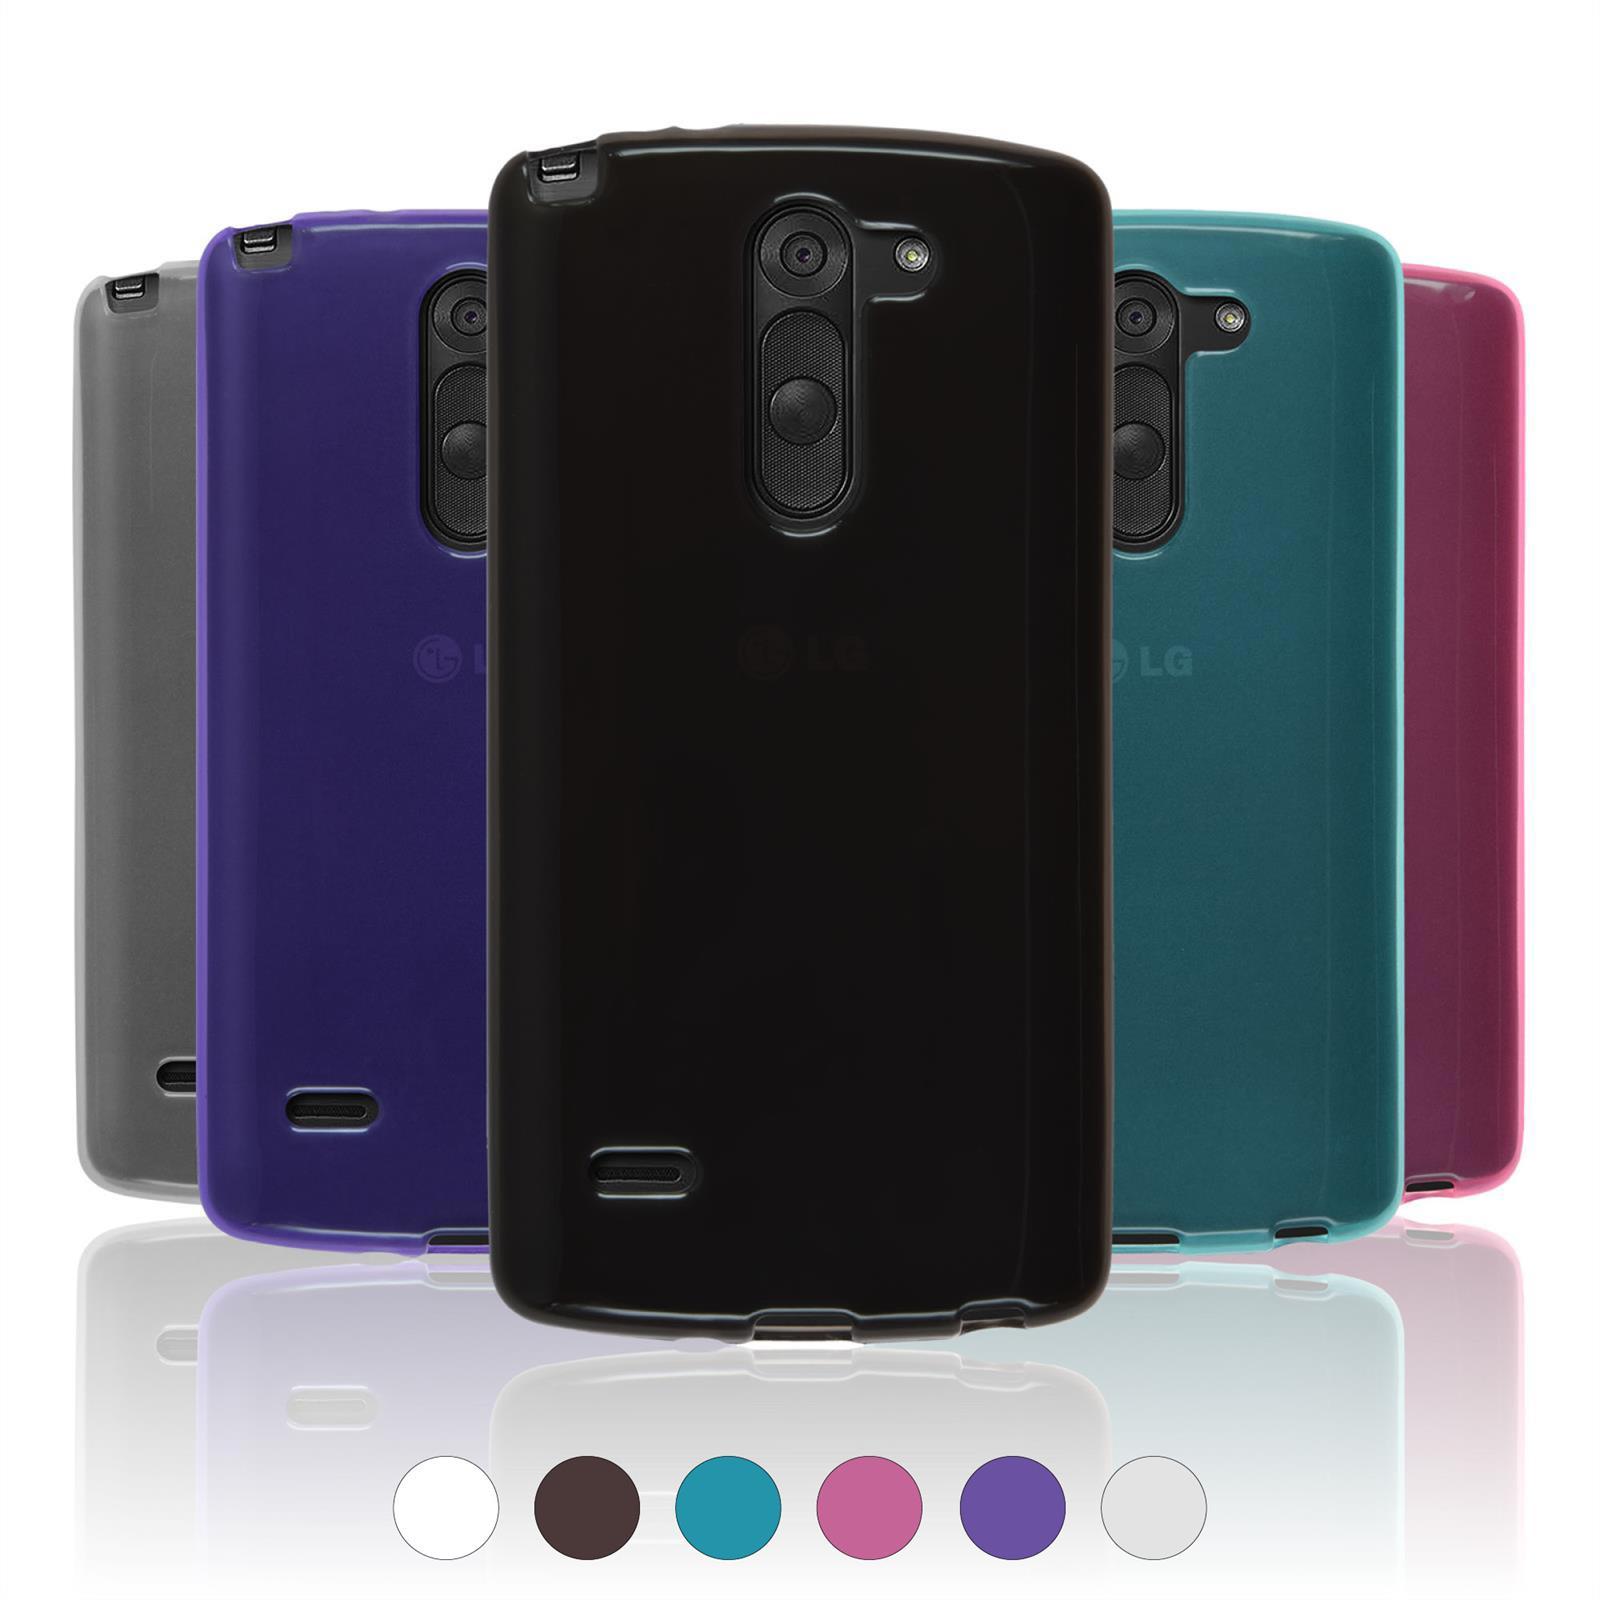 Funda-LG-transparente-Cover-Cubierta-TPU-protector-de-pantalla